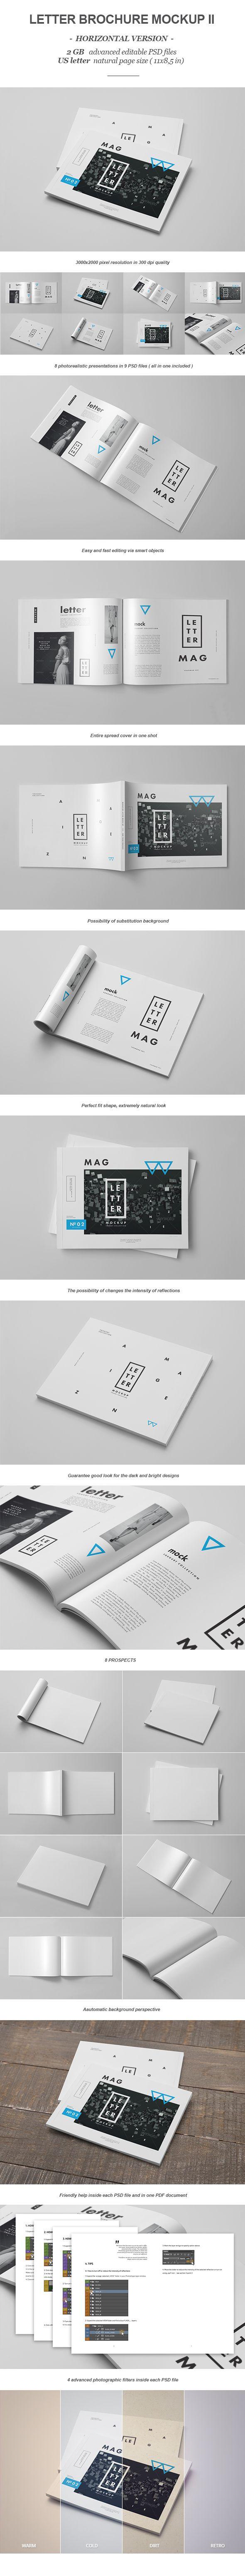 Horizontal Letter Magazine / Brochure Mock-up 2 by yogurt86 Design Studio, via Behance